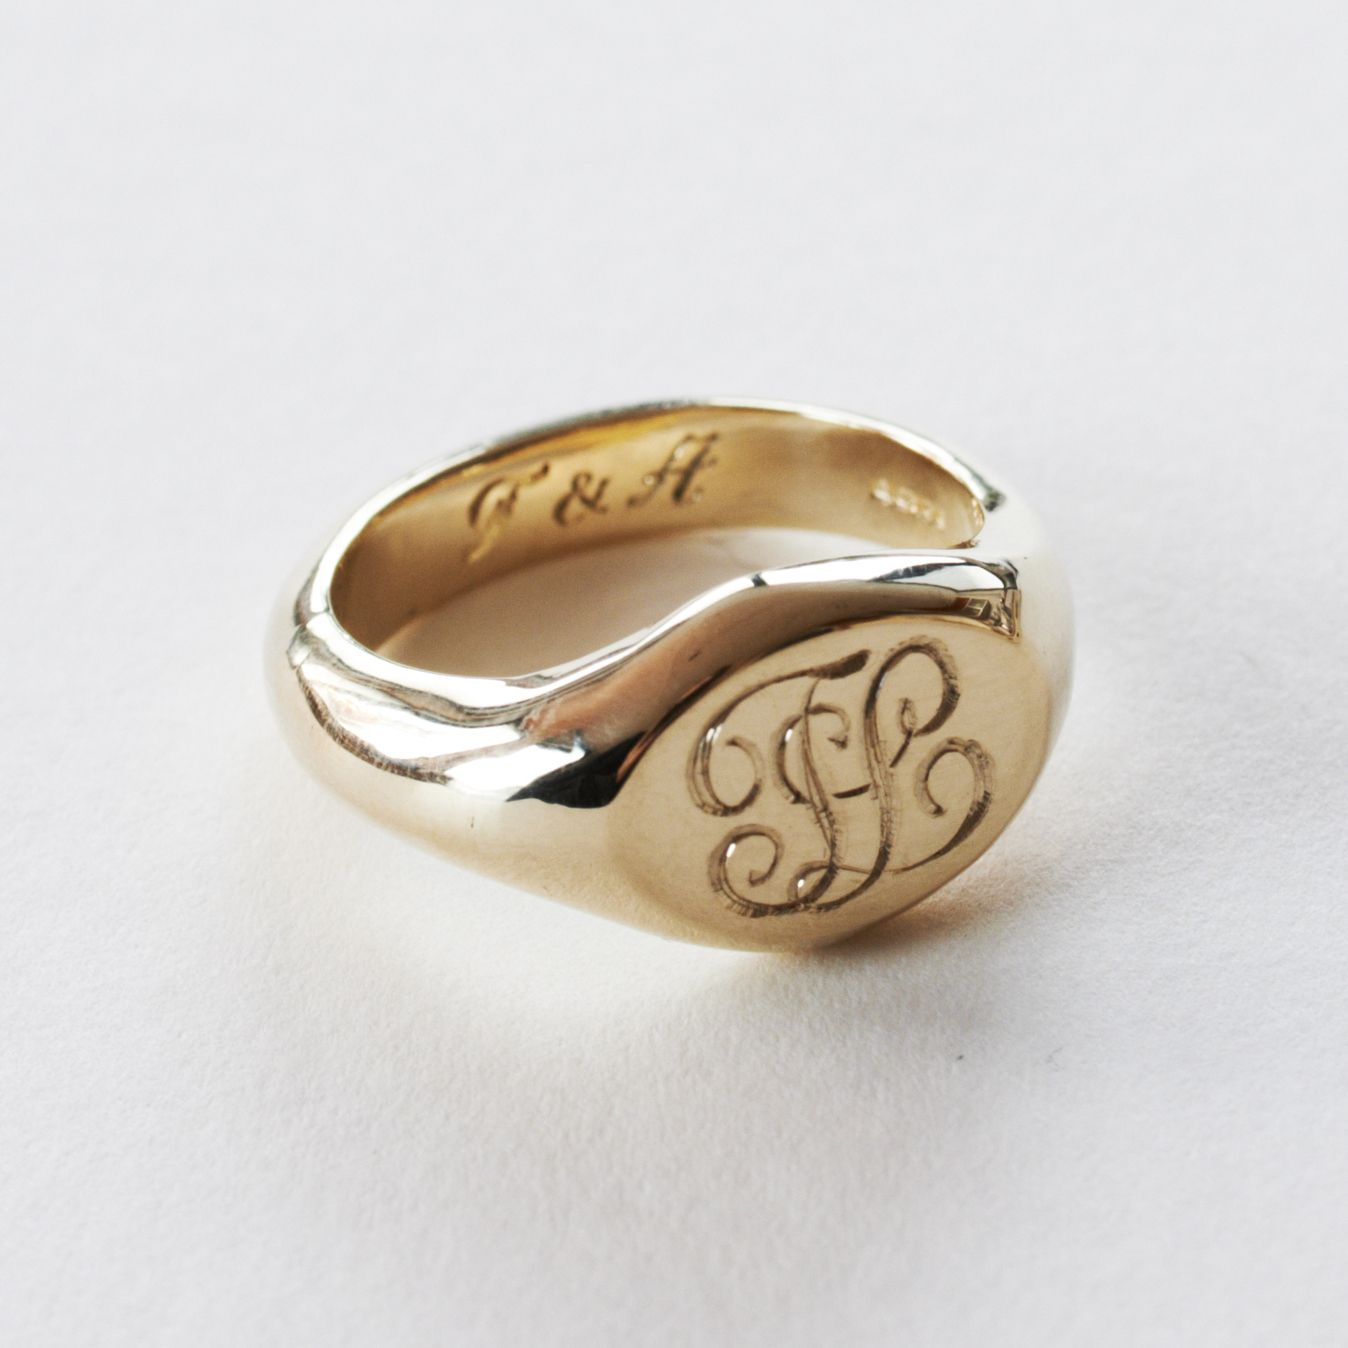 Lovegold Signet Rings Silver Ring Designs Signet Ring Rings